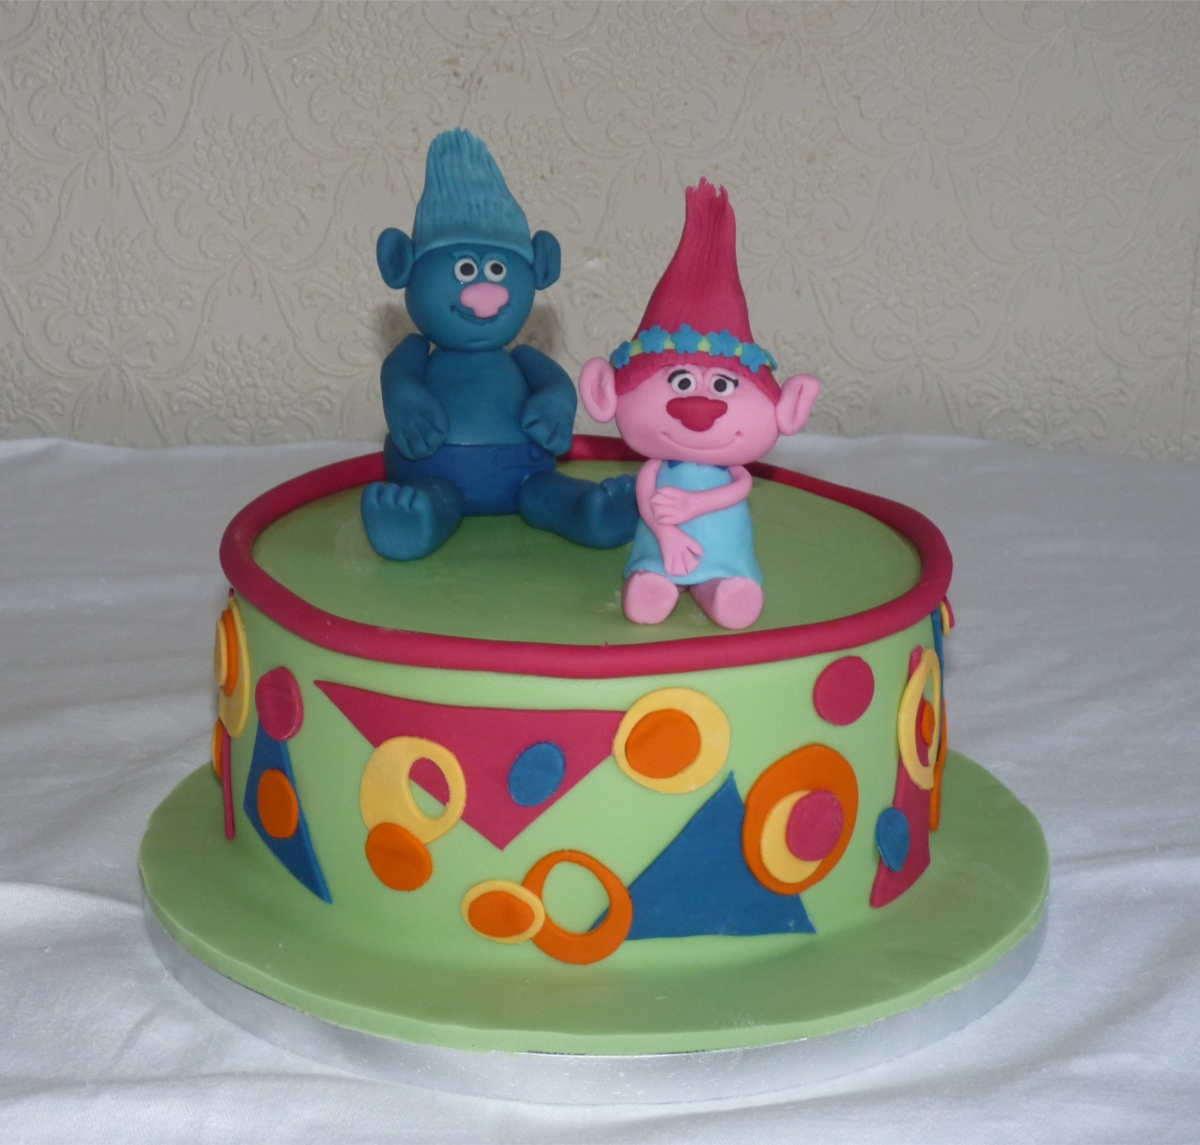 Baking Birthday Cakes At Home